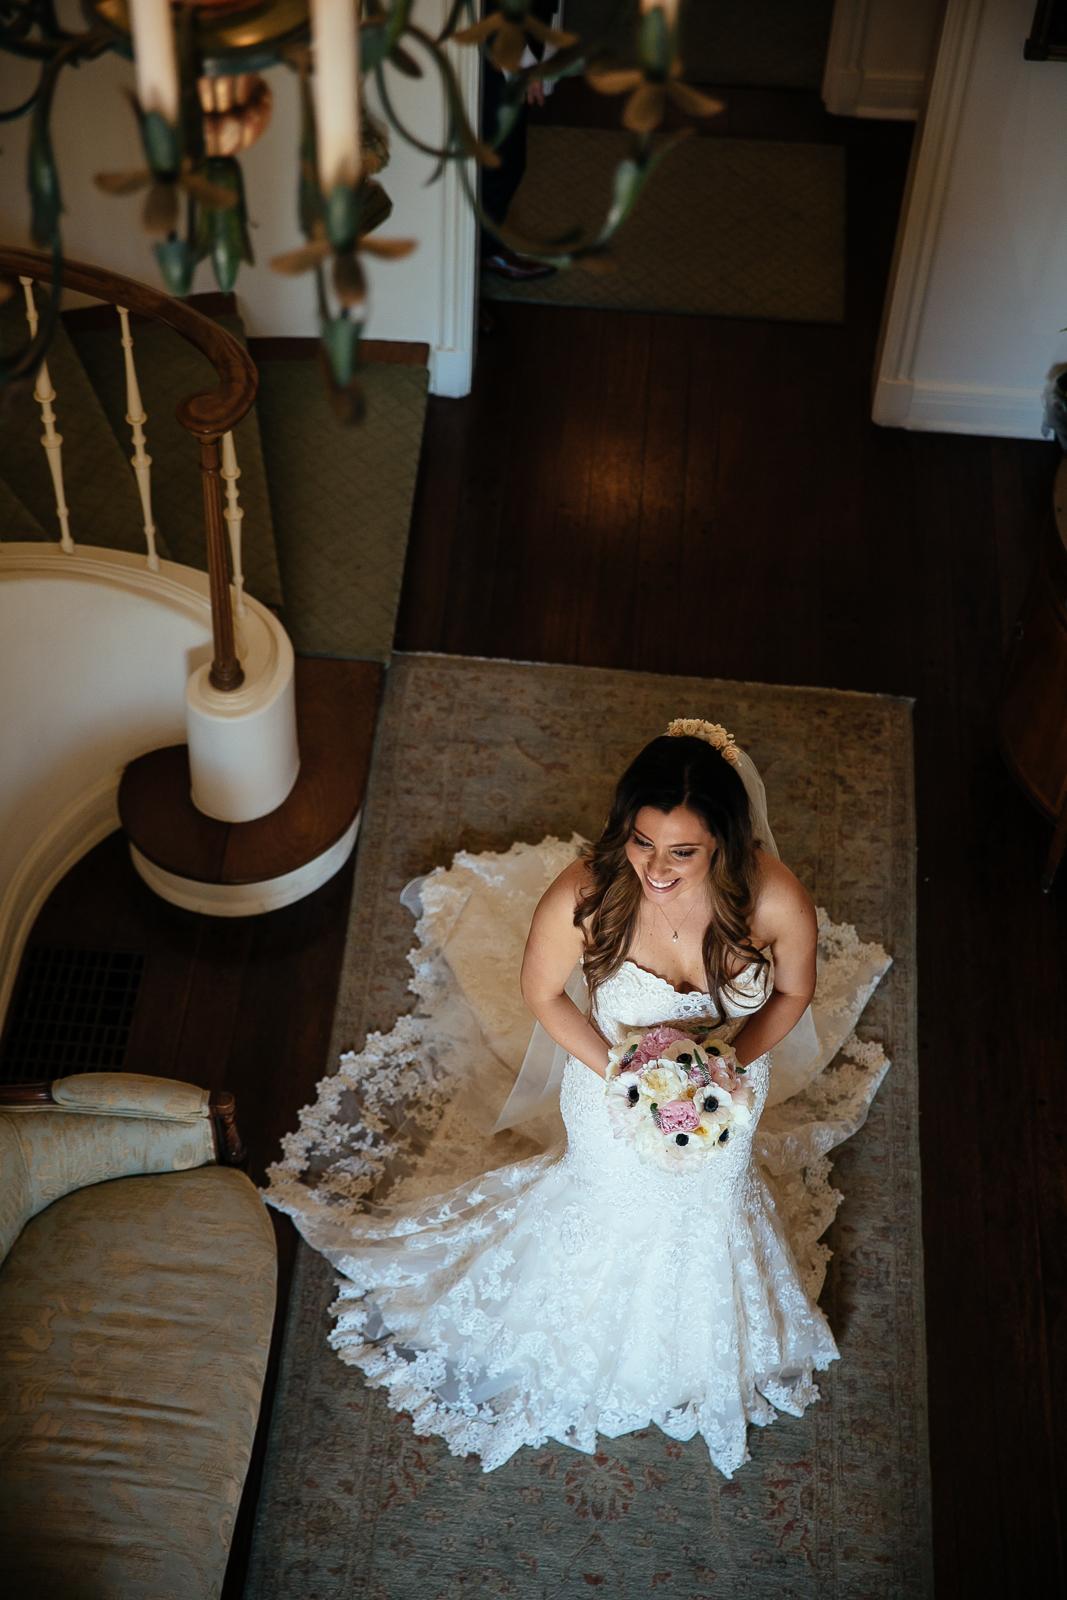 Amanda_&_Steve_Wedding_Darlington_House_La_Jolla_2015_1M2A1846.JPG